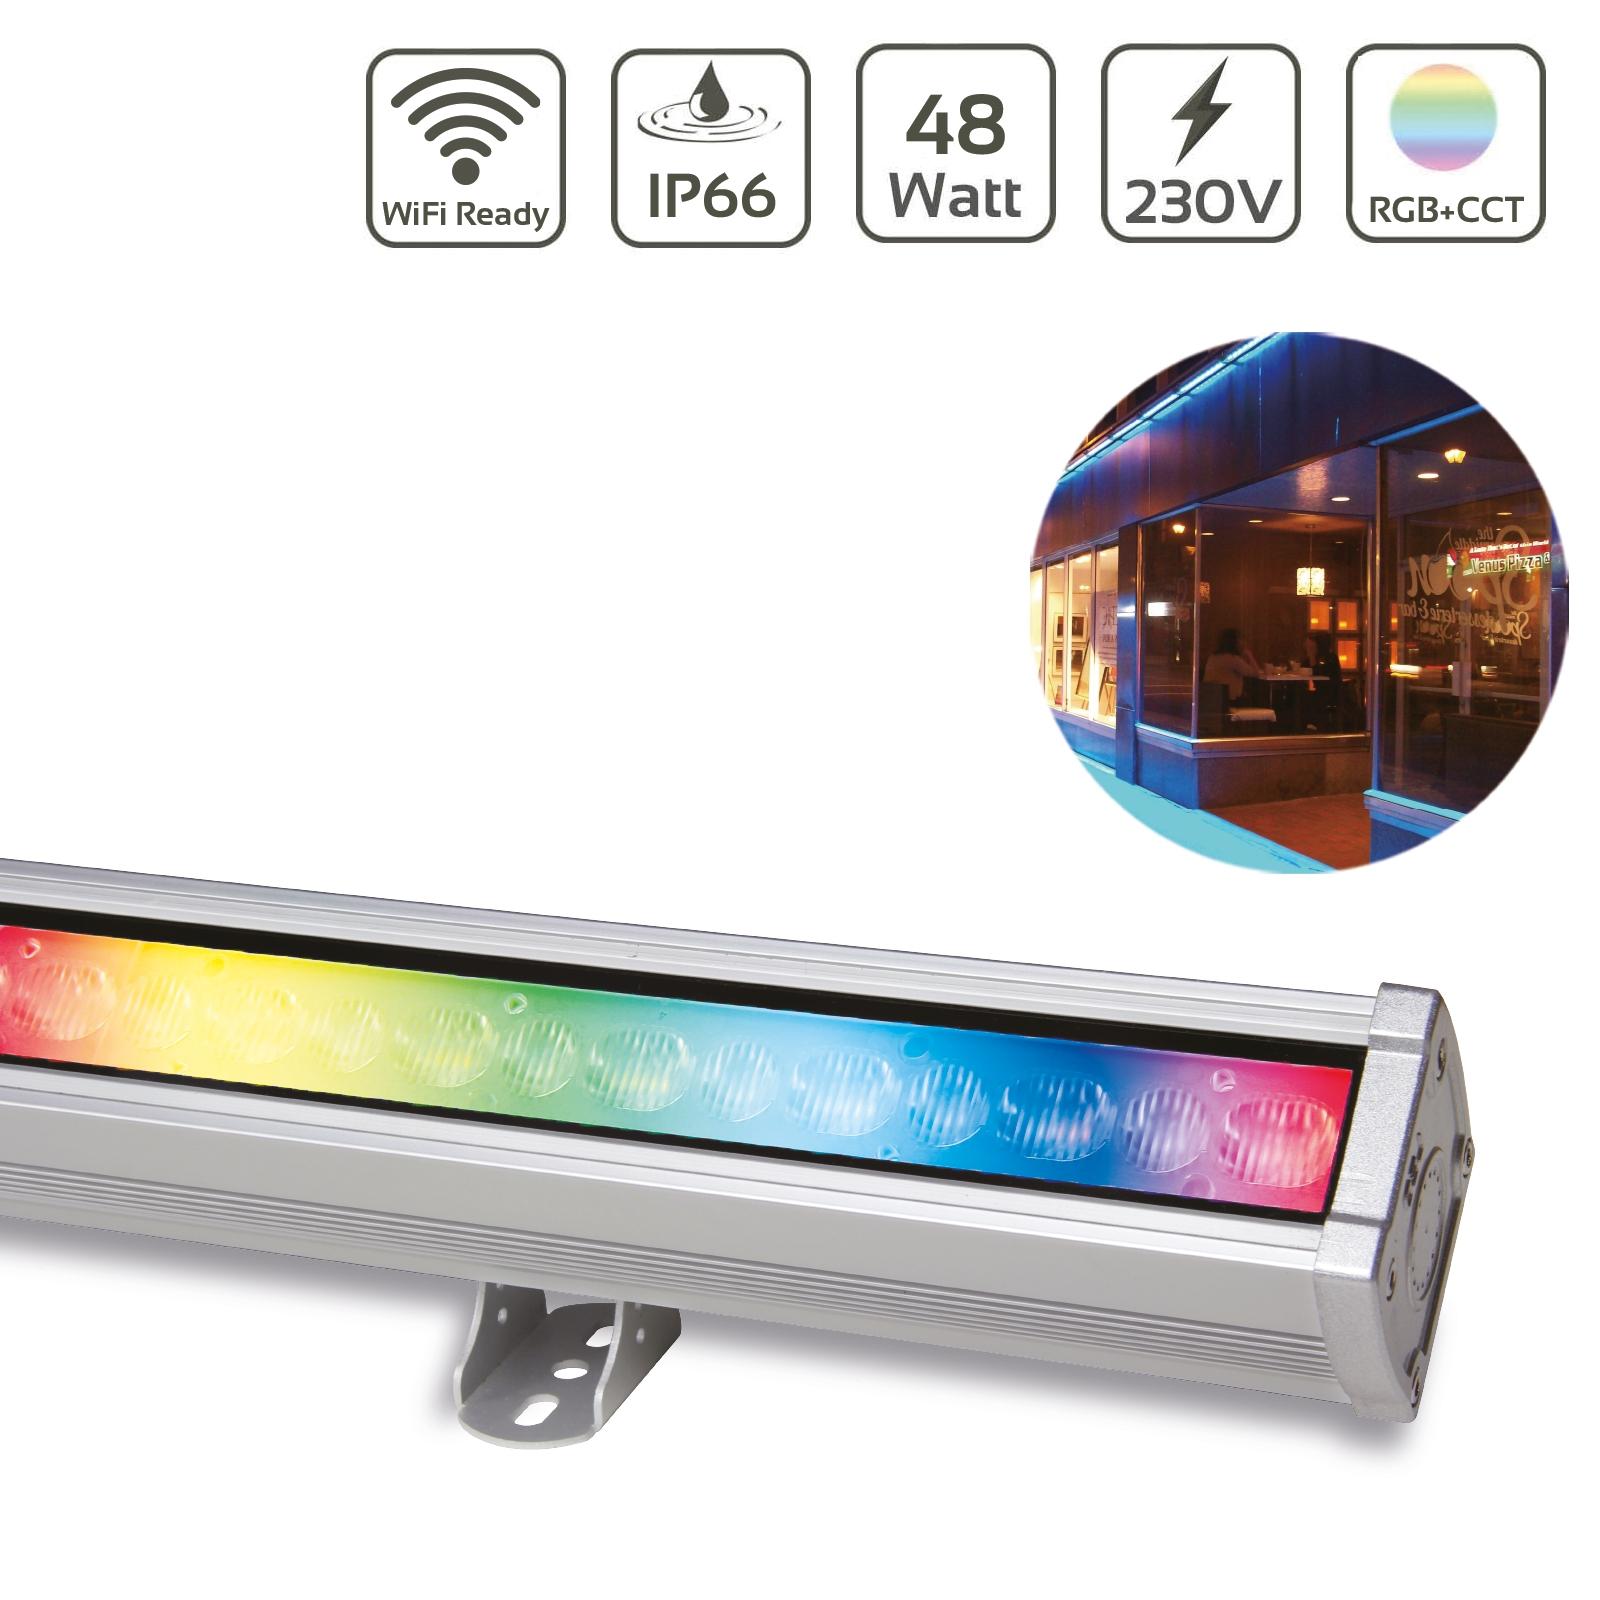 MiBoxer 48W RGB+CCT LED Wallwasher WiFi Fassadenstrahler 230V IP66 RL2-48